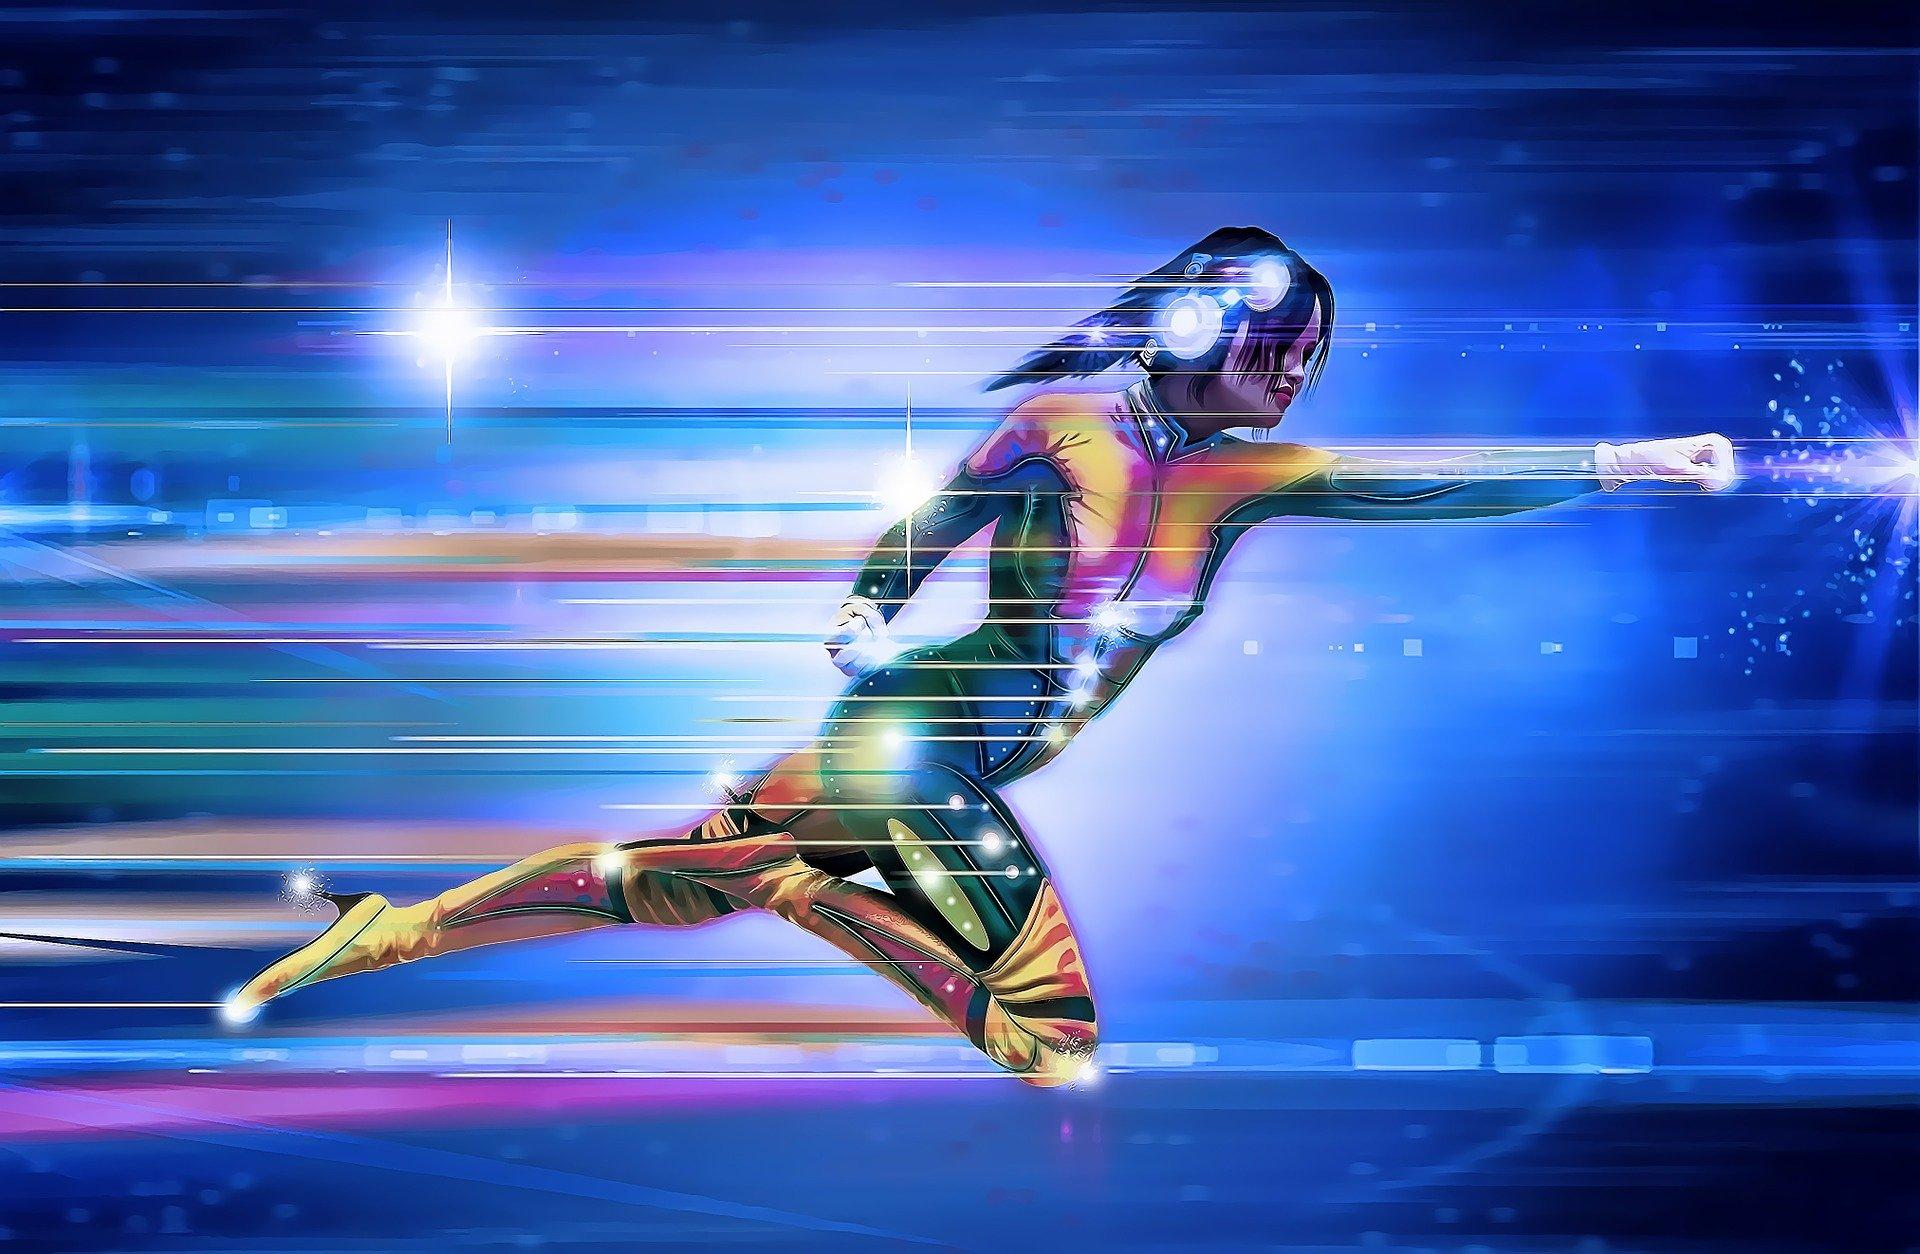 Riverside Web Design - Image of speed